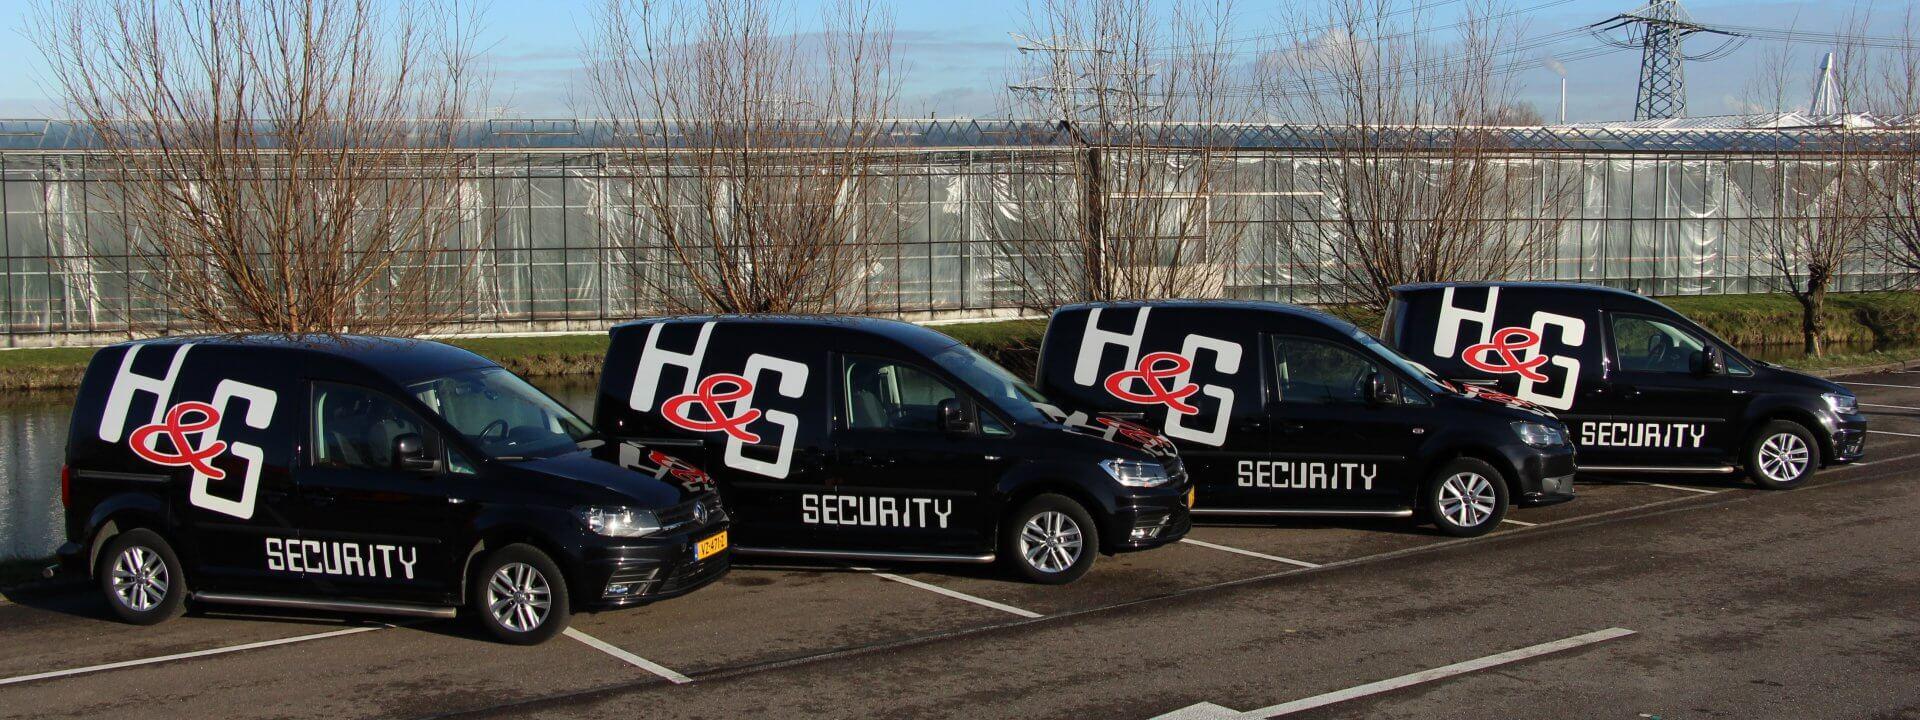 H&G Security Header